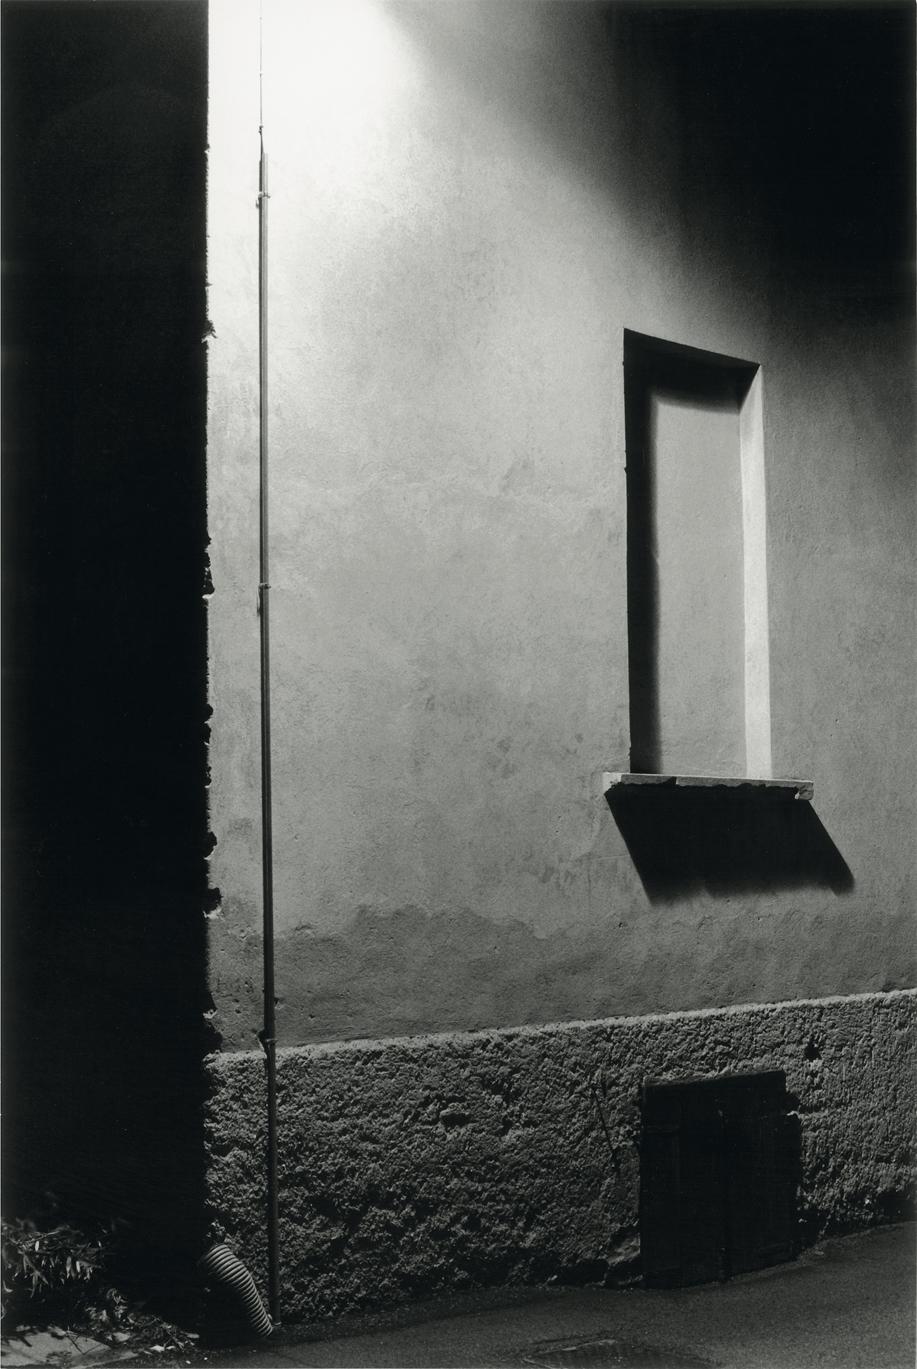 06) Study n. 10 (2012) Paolo Novelli